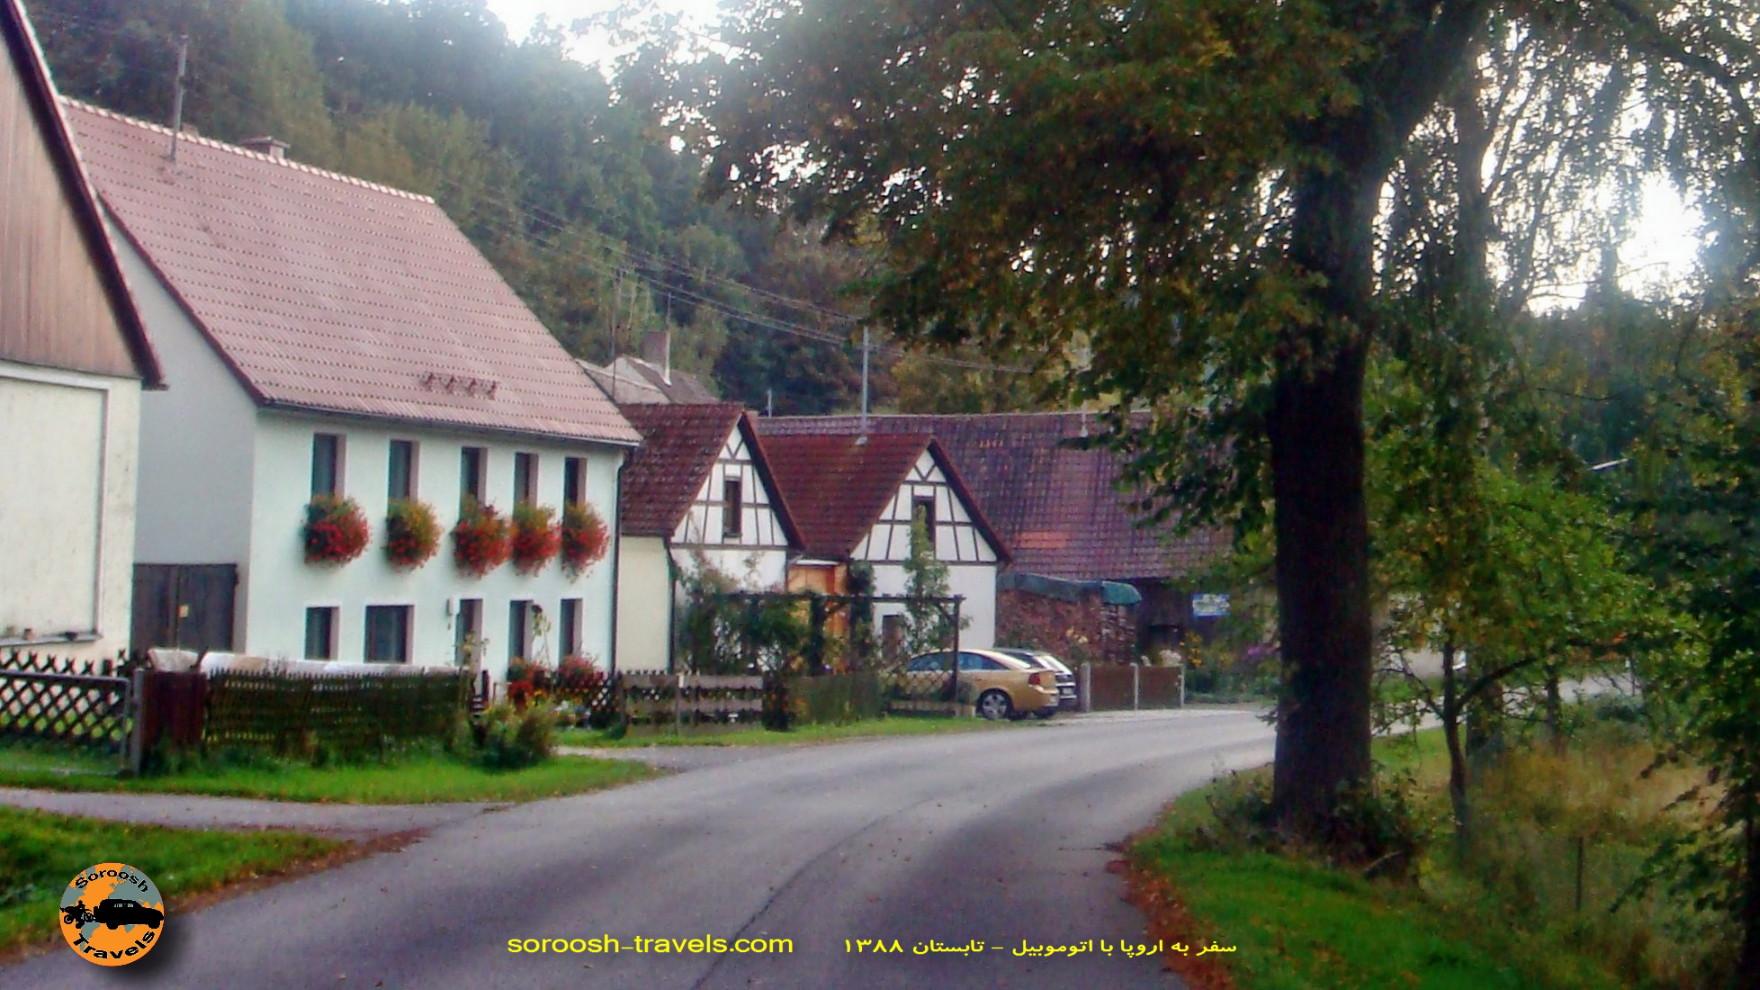 31-shahrivar-1388-22-september-2009-ludwigsburg-in-germany-to-prague-5